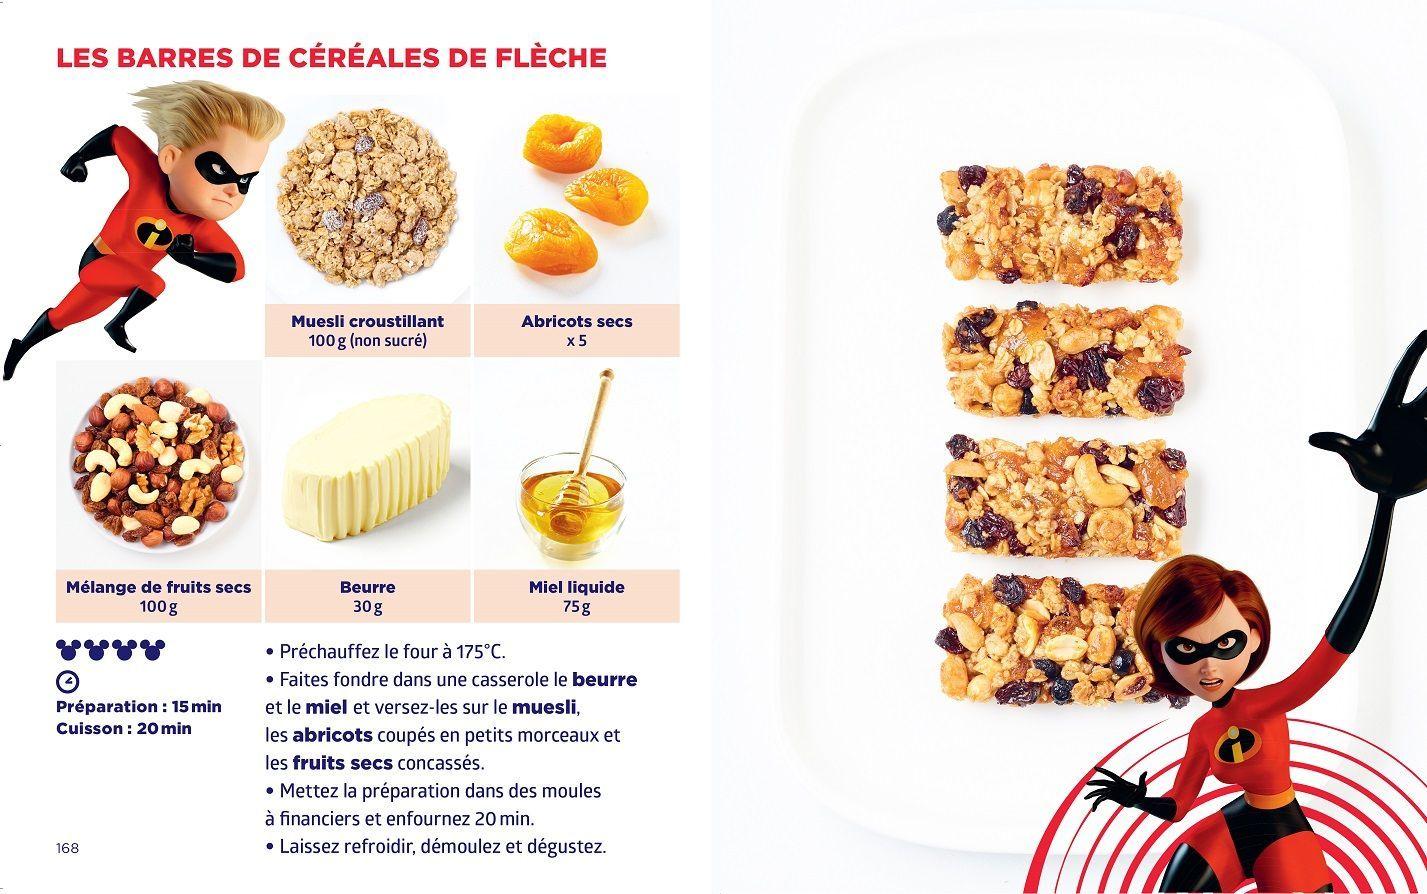 Barres cereales Fleche - Simplissime Disney